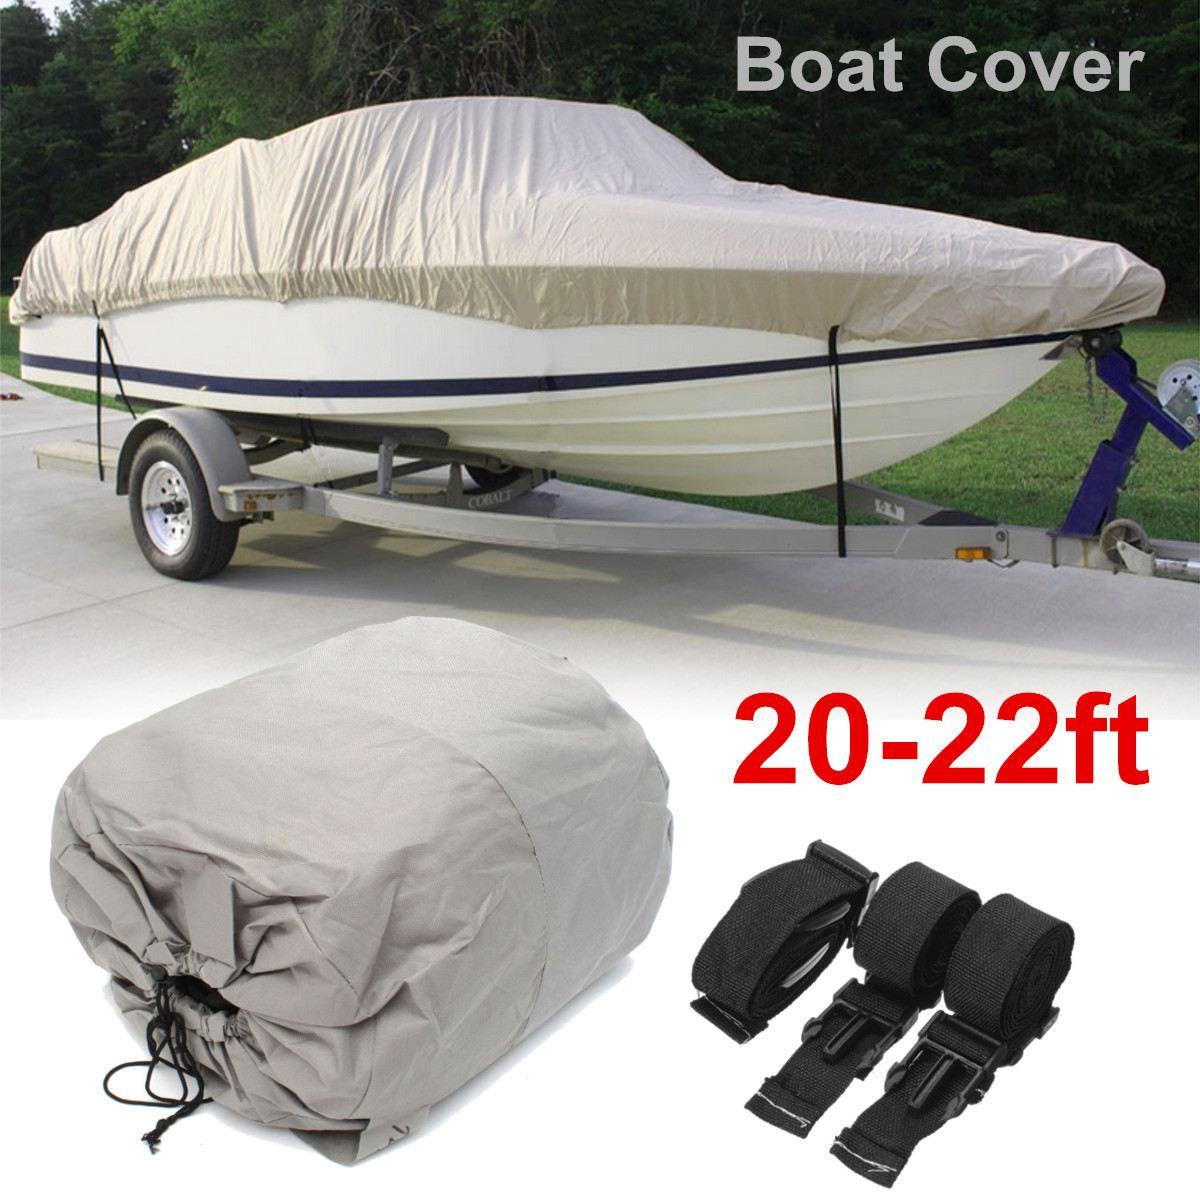 20-22ft 600D серый водостойкий тяжелый чехол для лодки Рыбалка Лыжный VHull